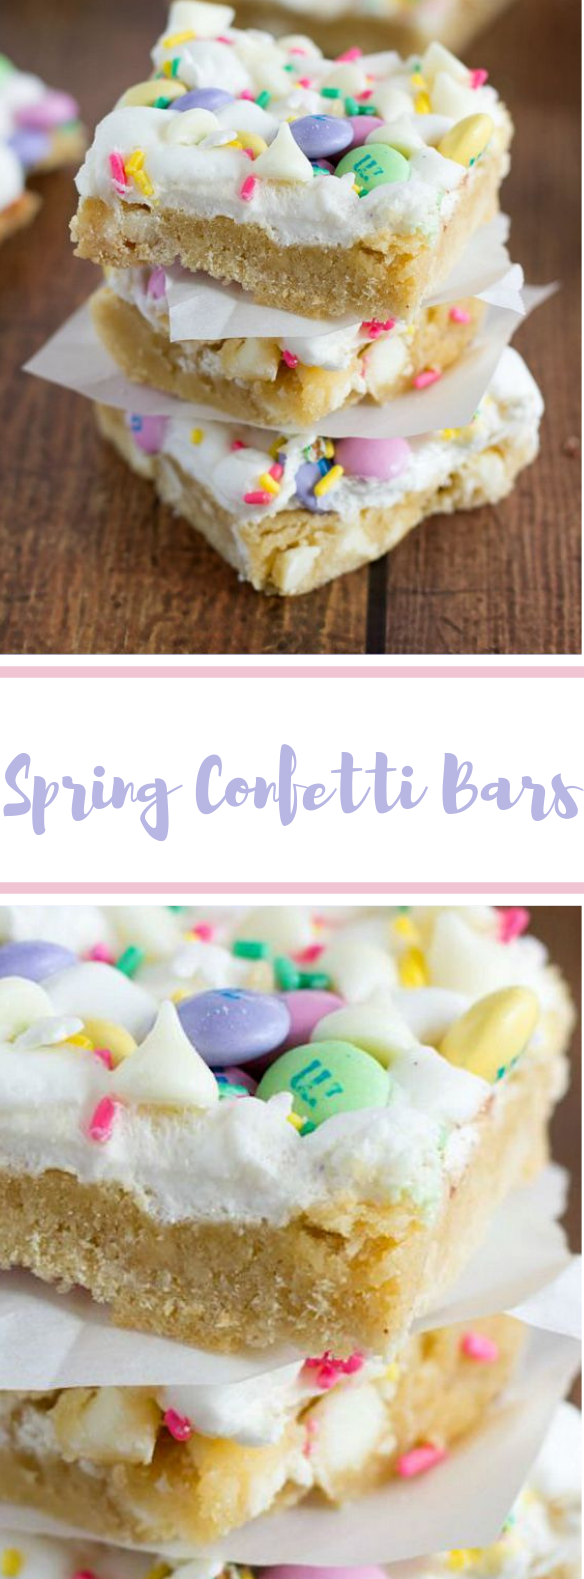 Spring Confetti Bars #easter #desserts